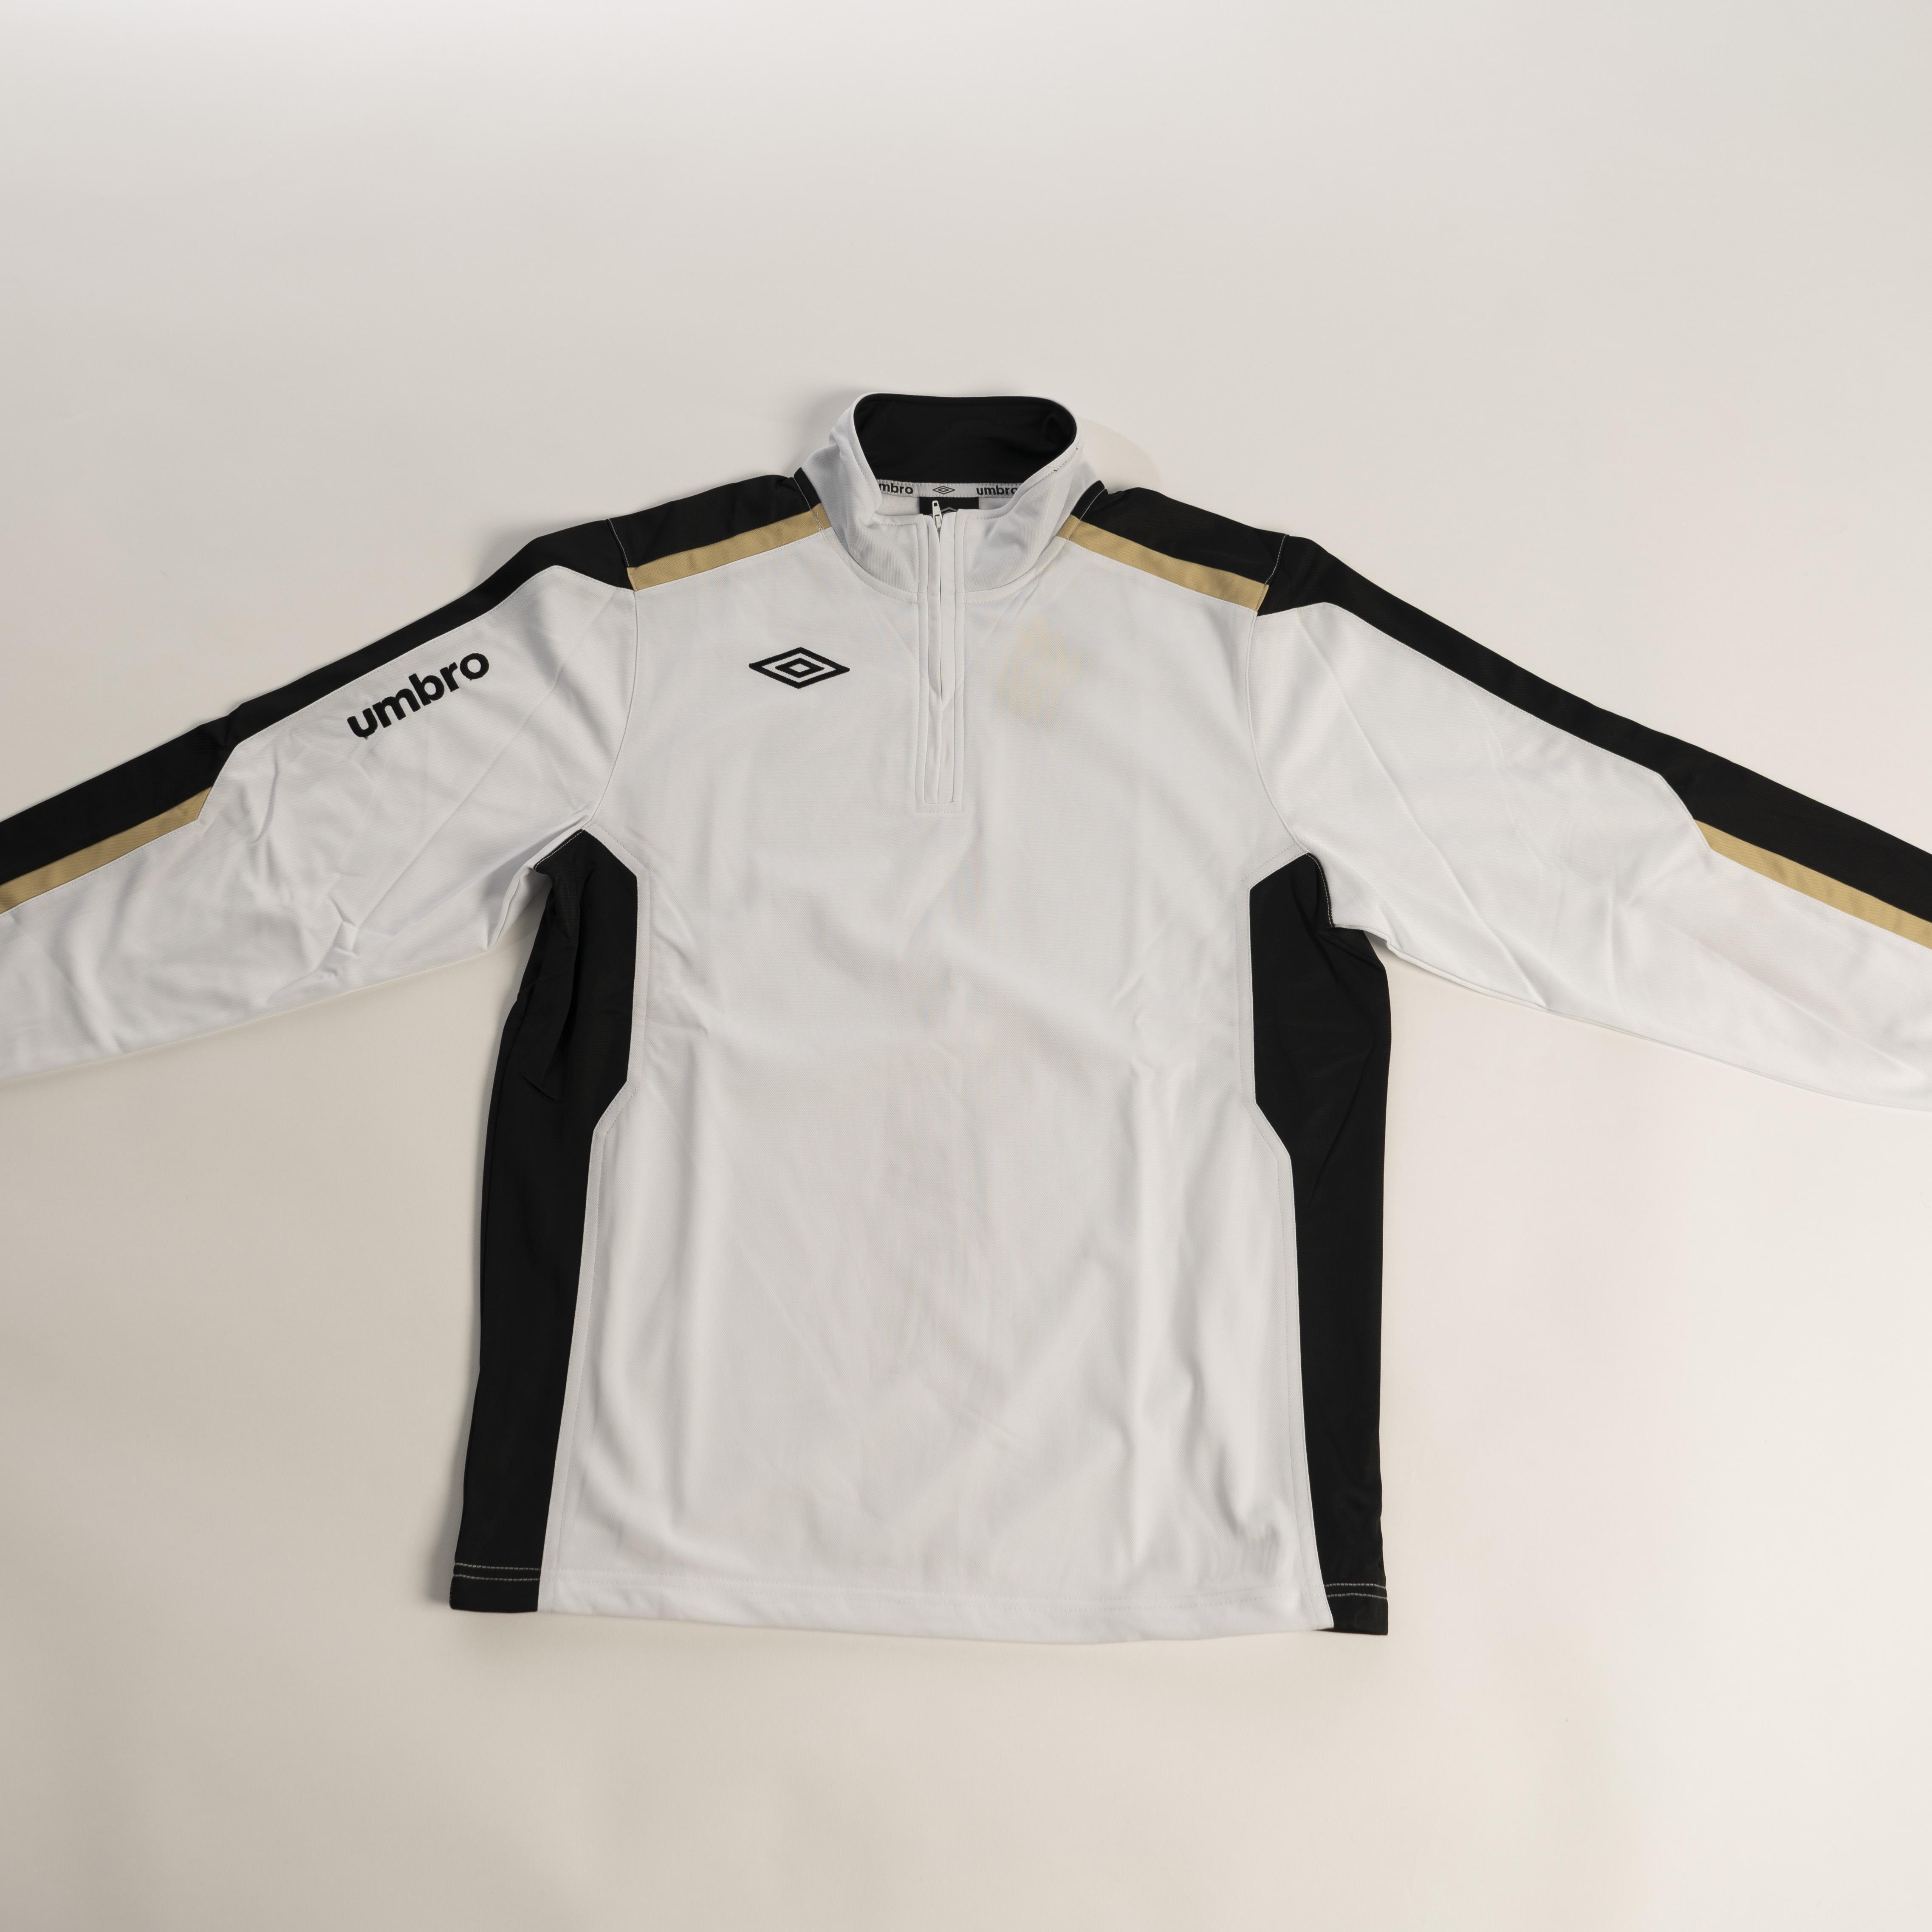 Umbro Men/'s Sweatshirt Red//Black//White Training Jersey Activewear